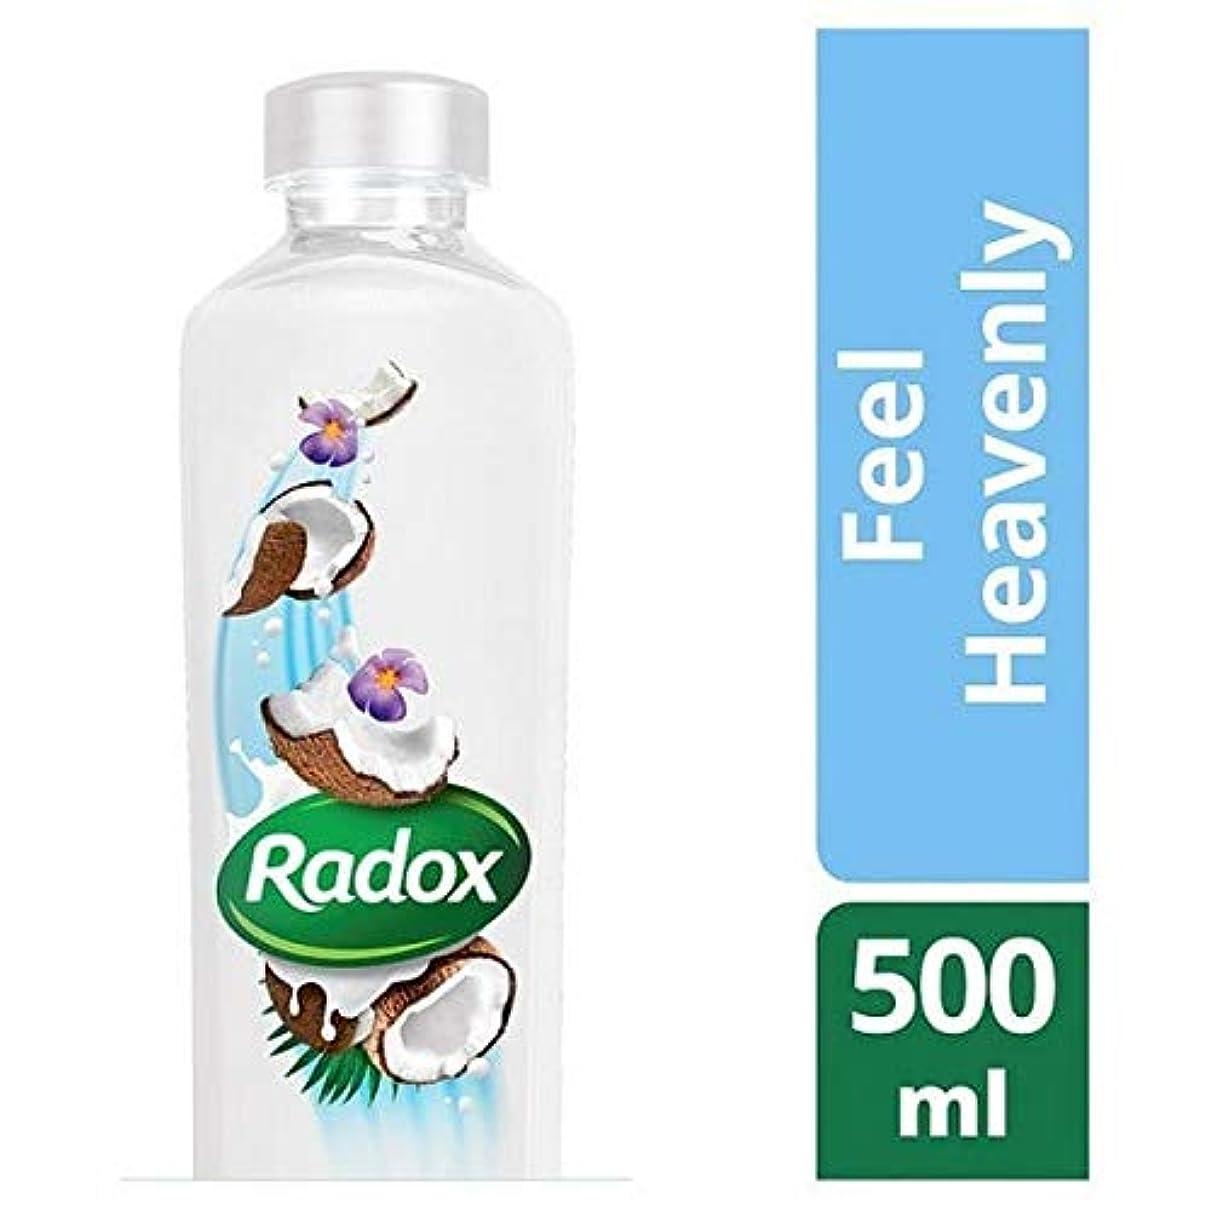 [Radox] Radoxは天国の500ミリリットルを感じます - Radox Feel Heavenly 500ml [並行輸入品]